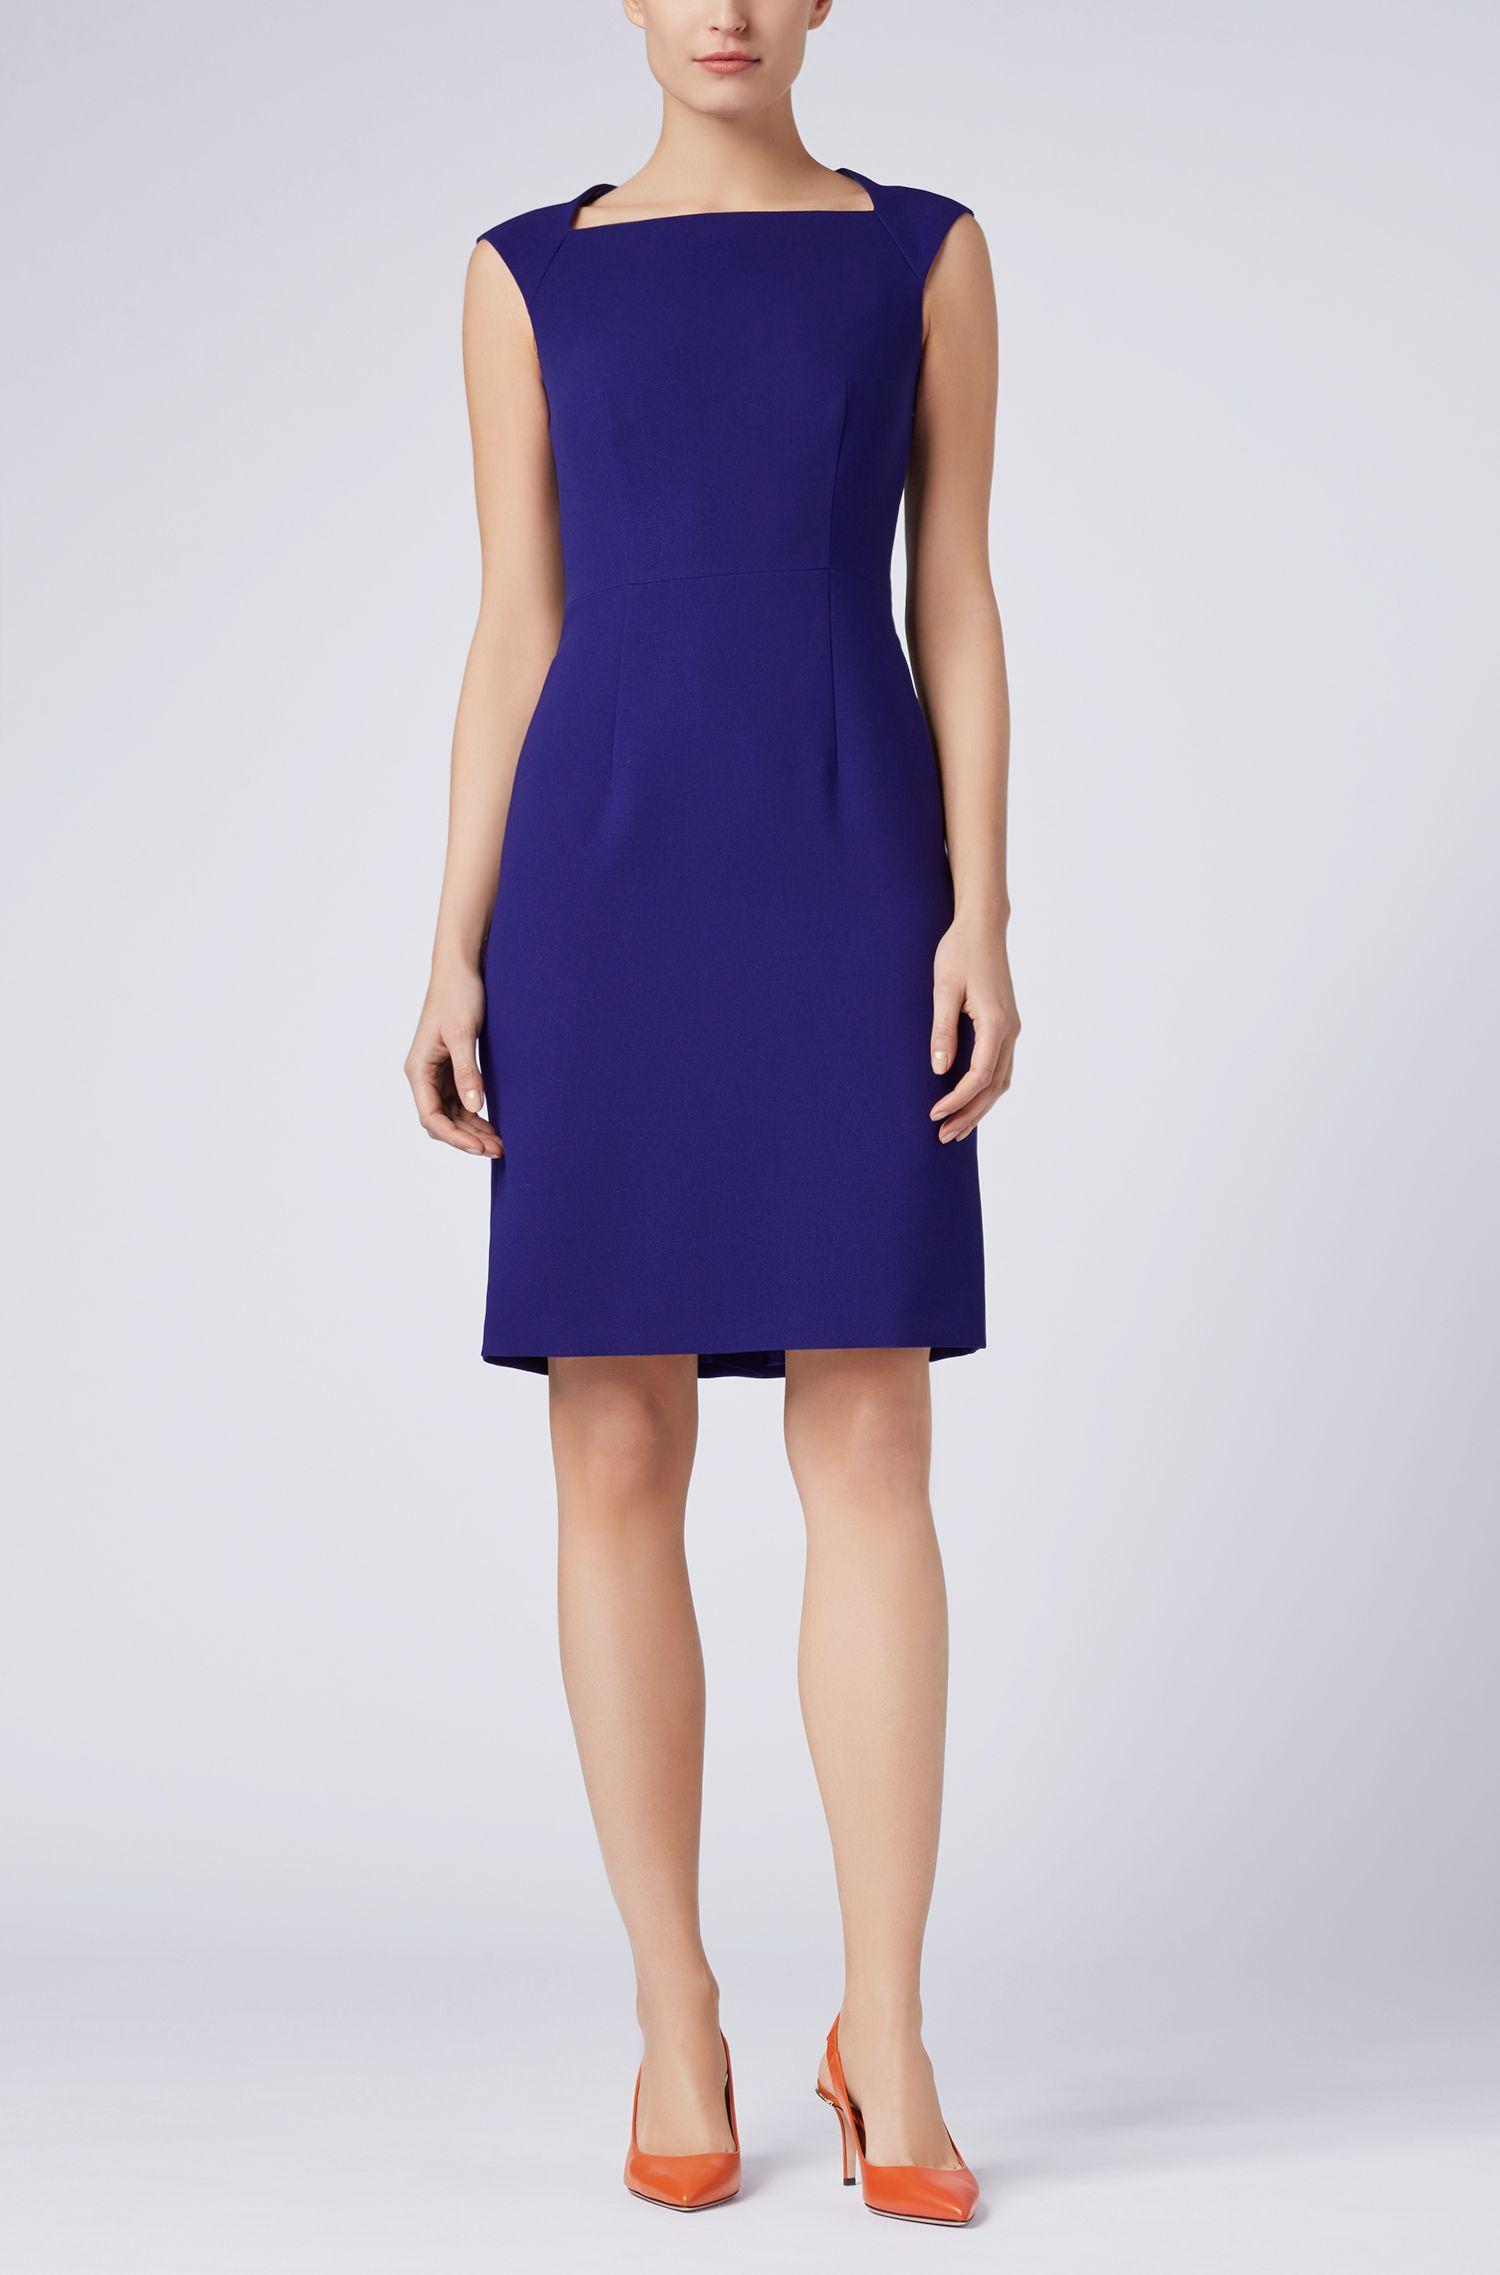 Sleeveless crepe dress with cutaway back